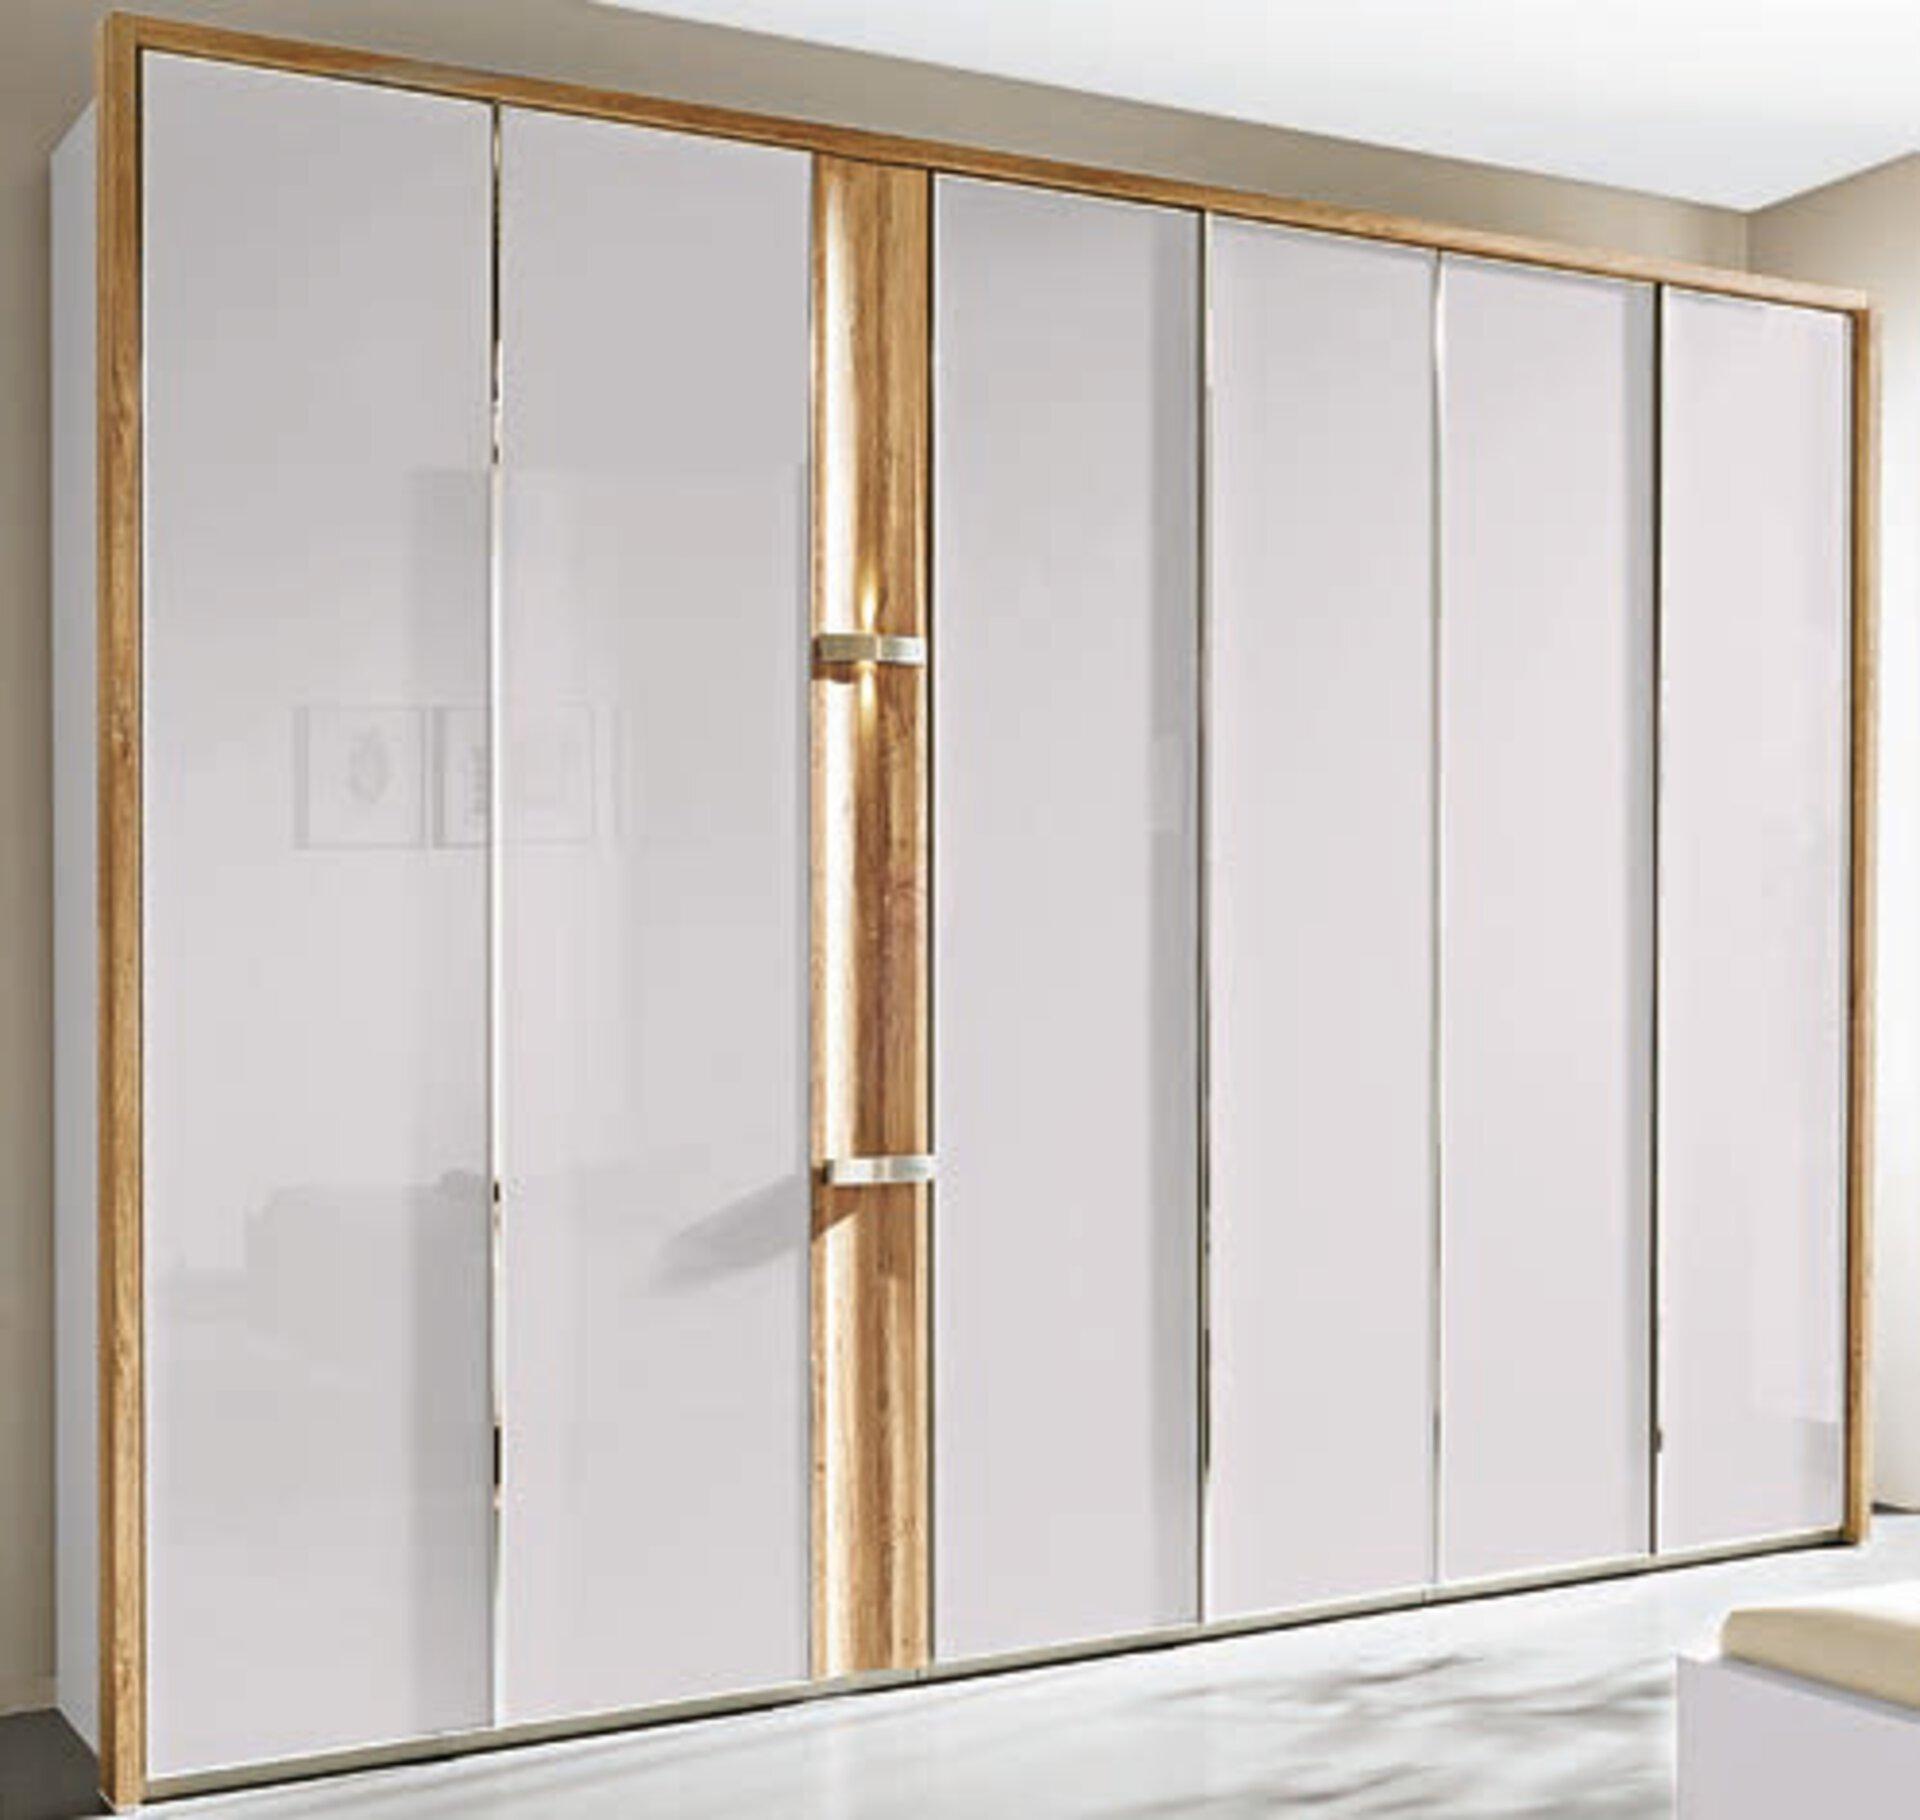 Drehtürenschrank COMBINO PLUS MONDO Holzwerkstoff grau 1 x 2 x 3 cm